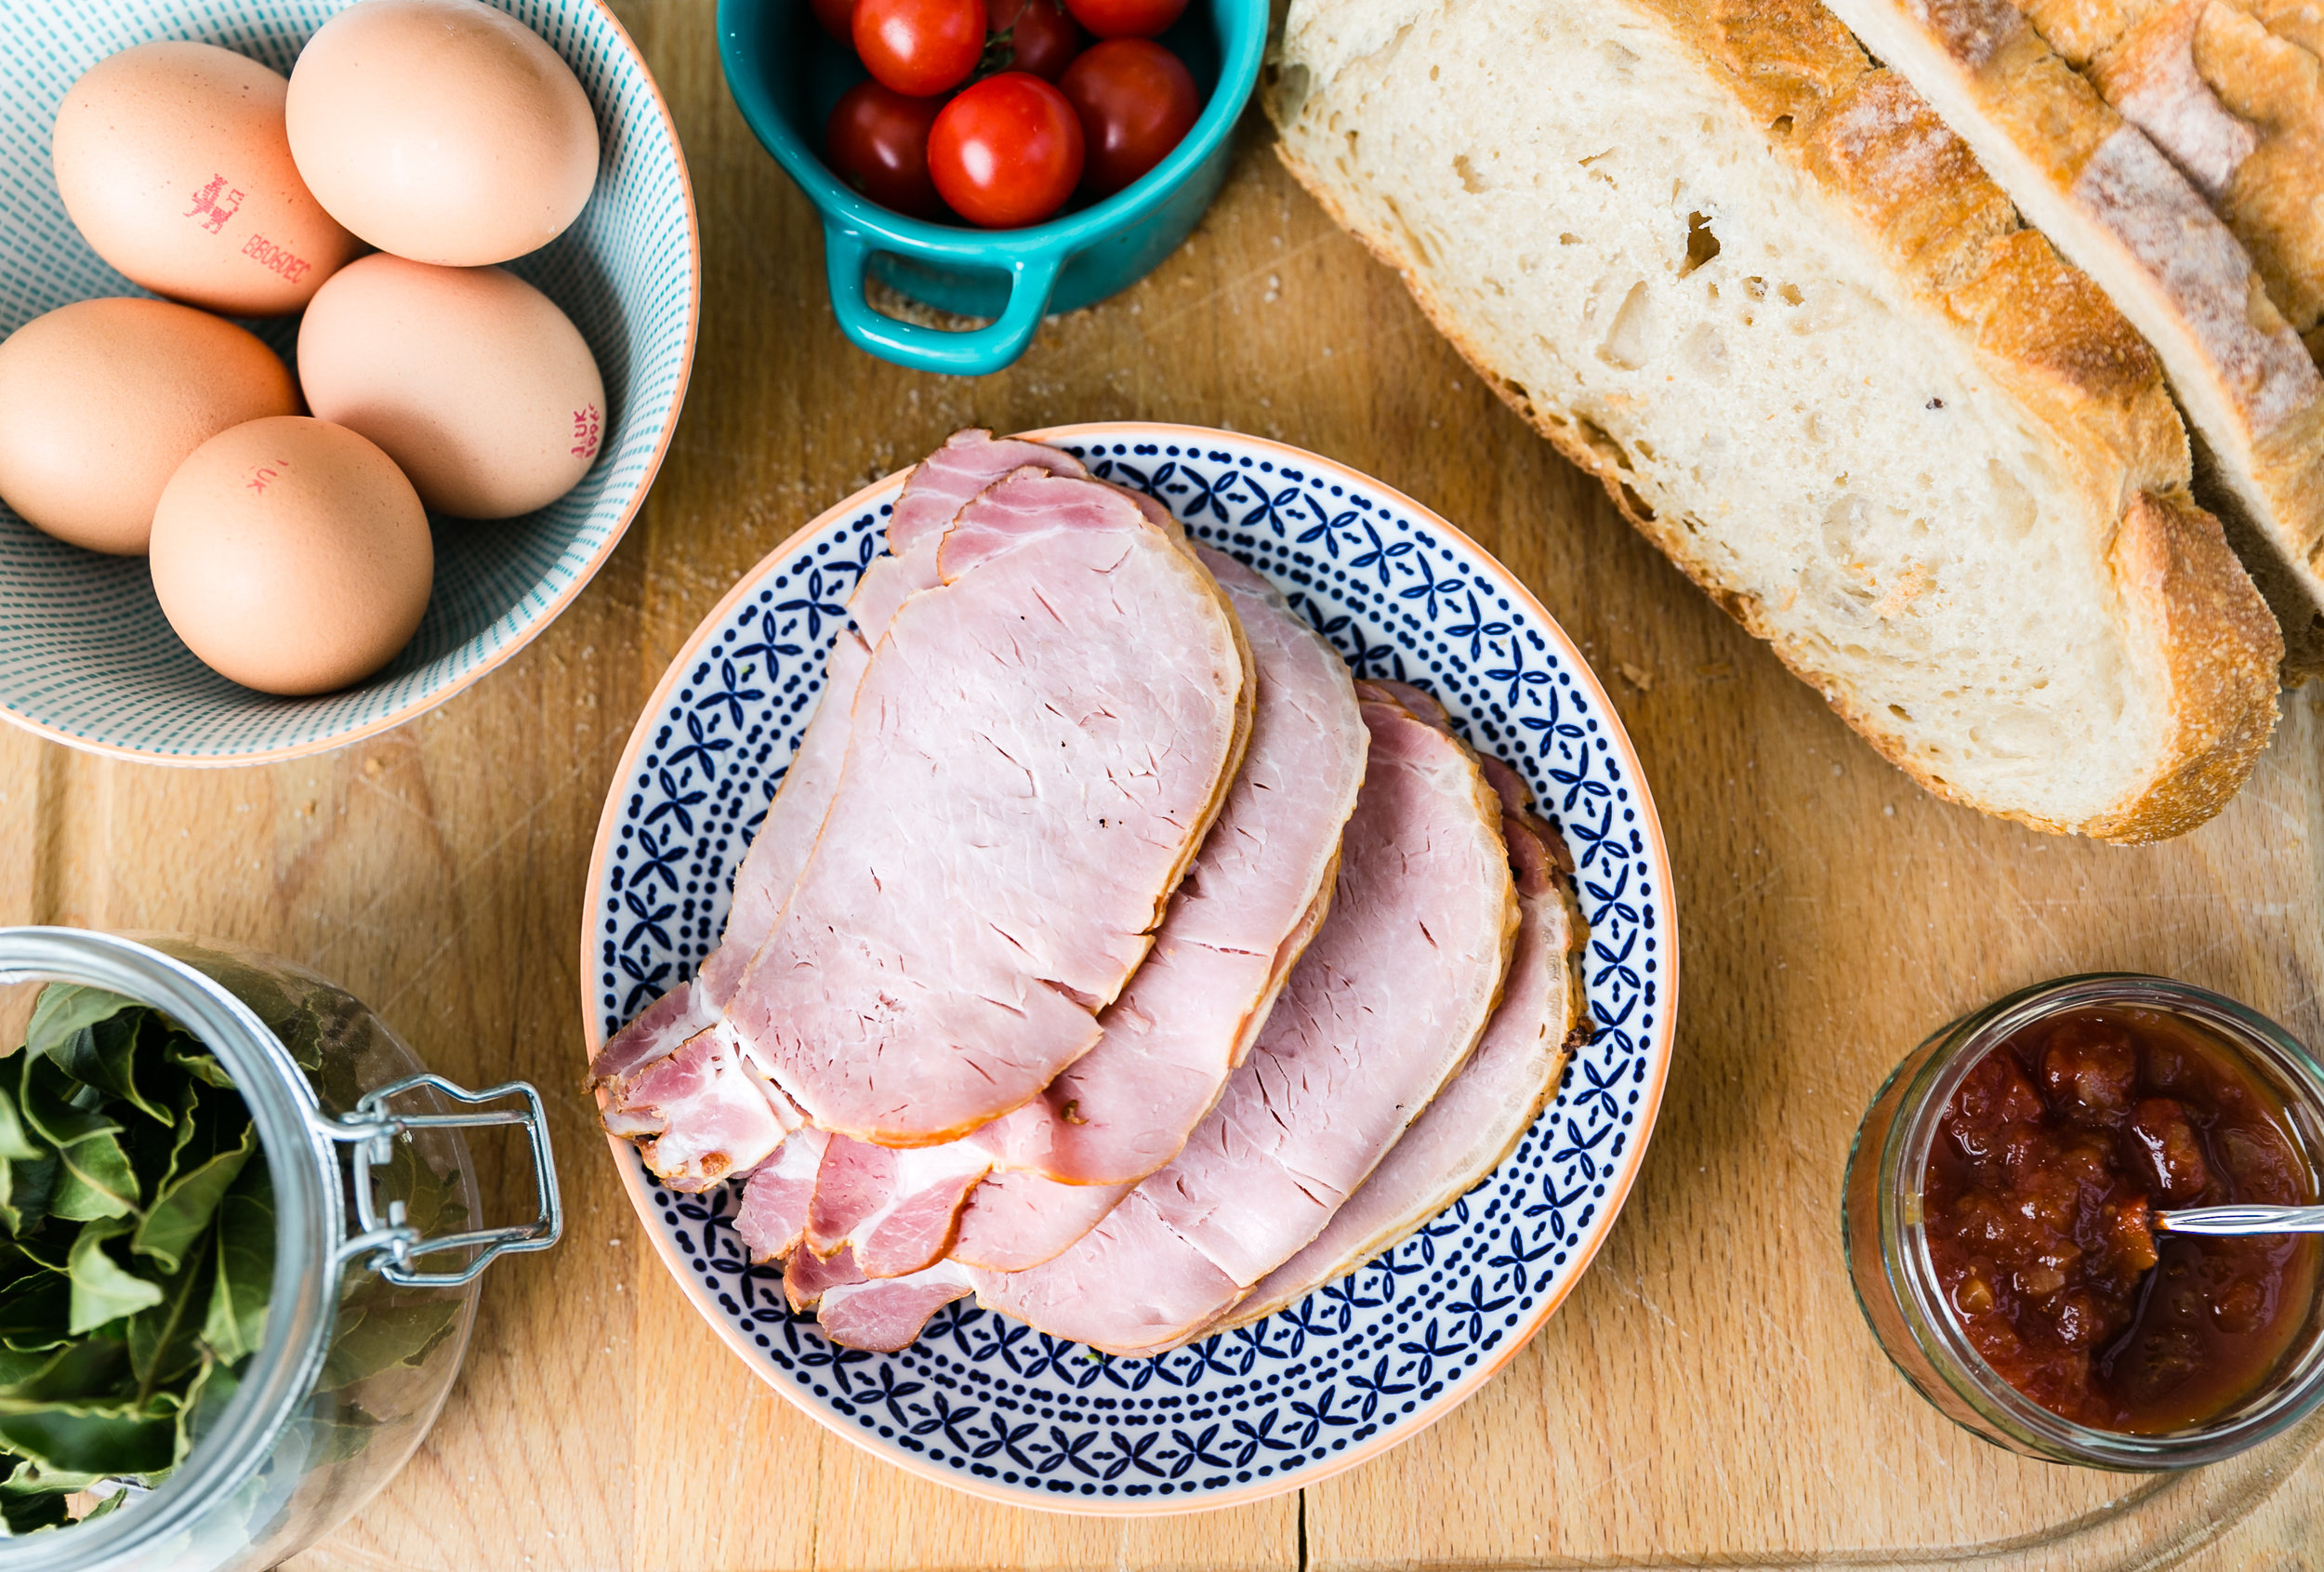 102 - Sussex Cured Meats Dec 2018-100.jpg